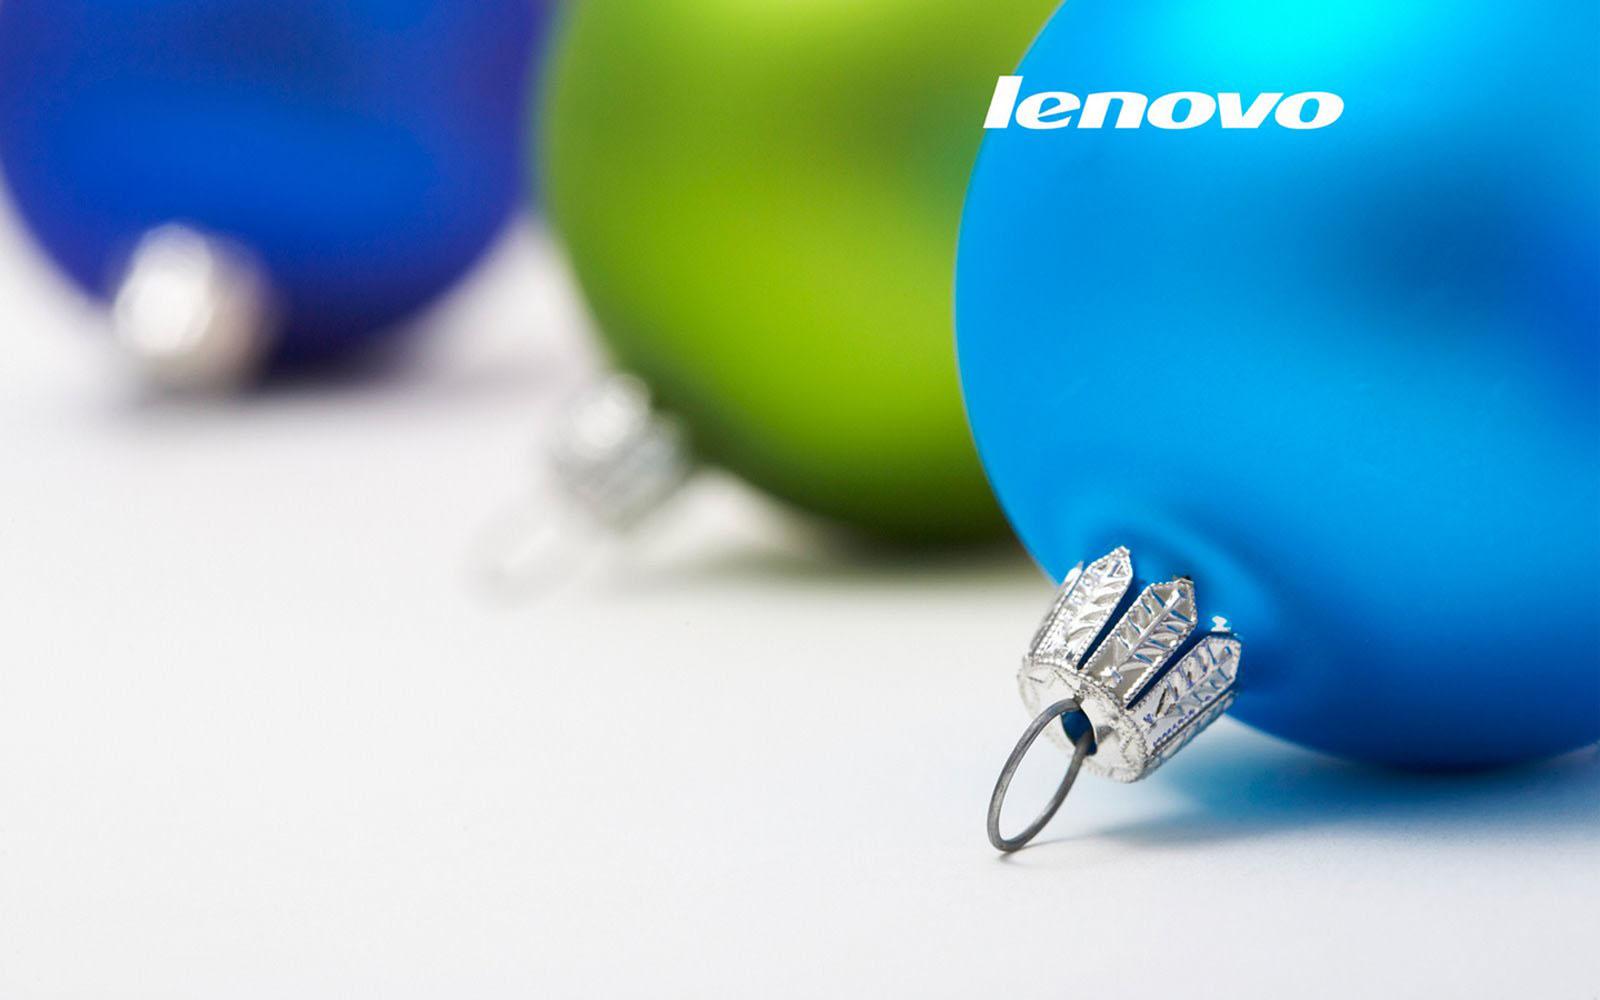 Lenovo Laptop Wallpapers Hd Car Wallpapers